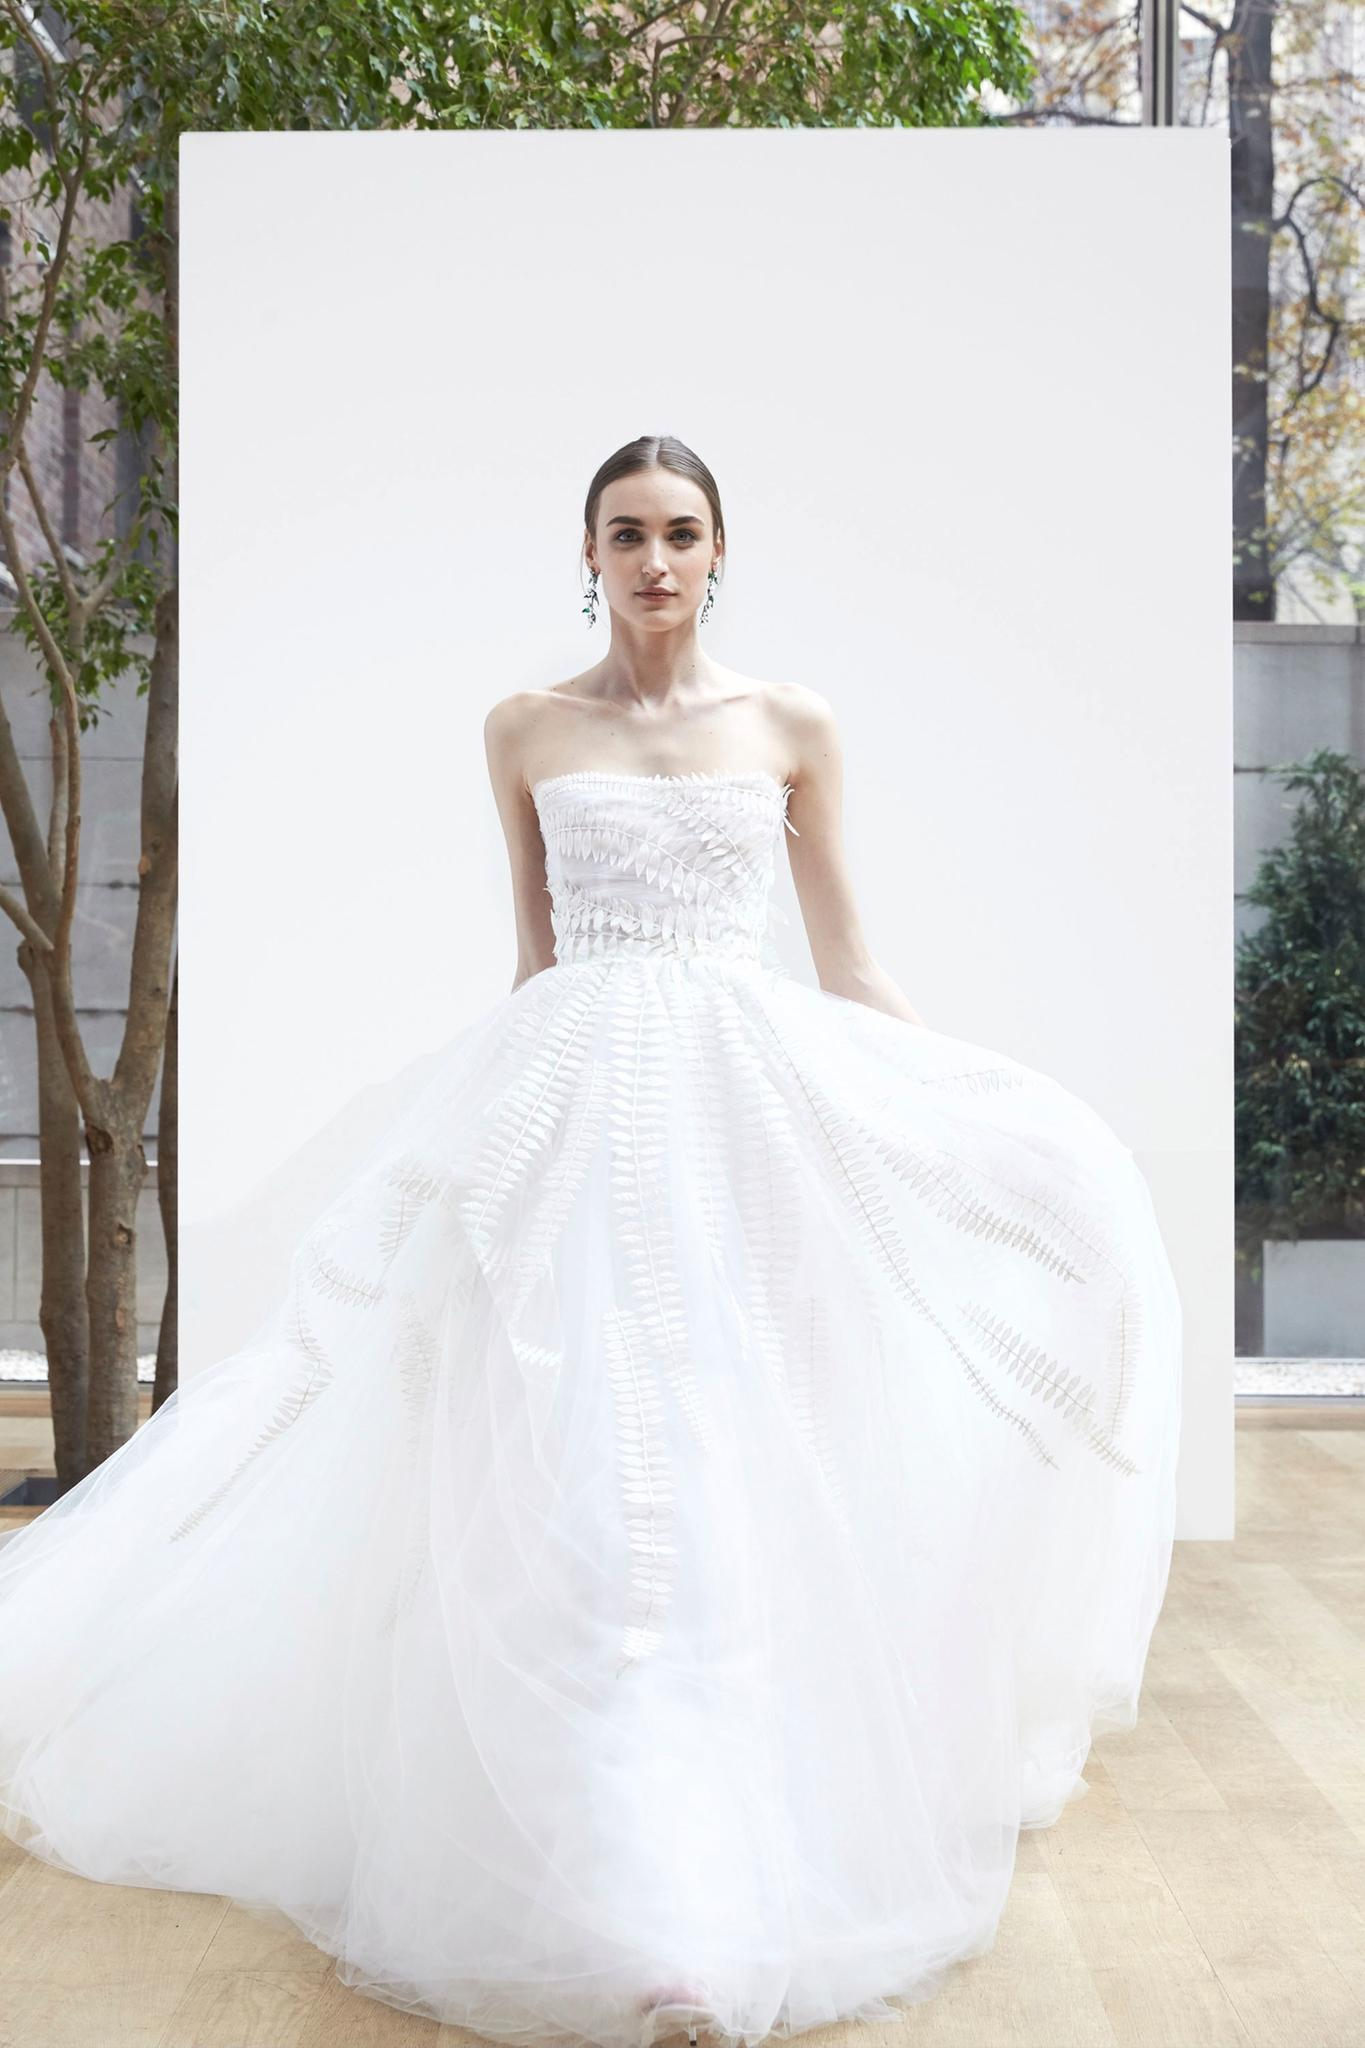 Brautkleider-Trends 2018: 3D-Blumen bei Oscar de la Renta